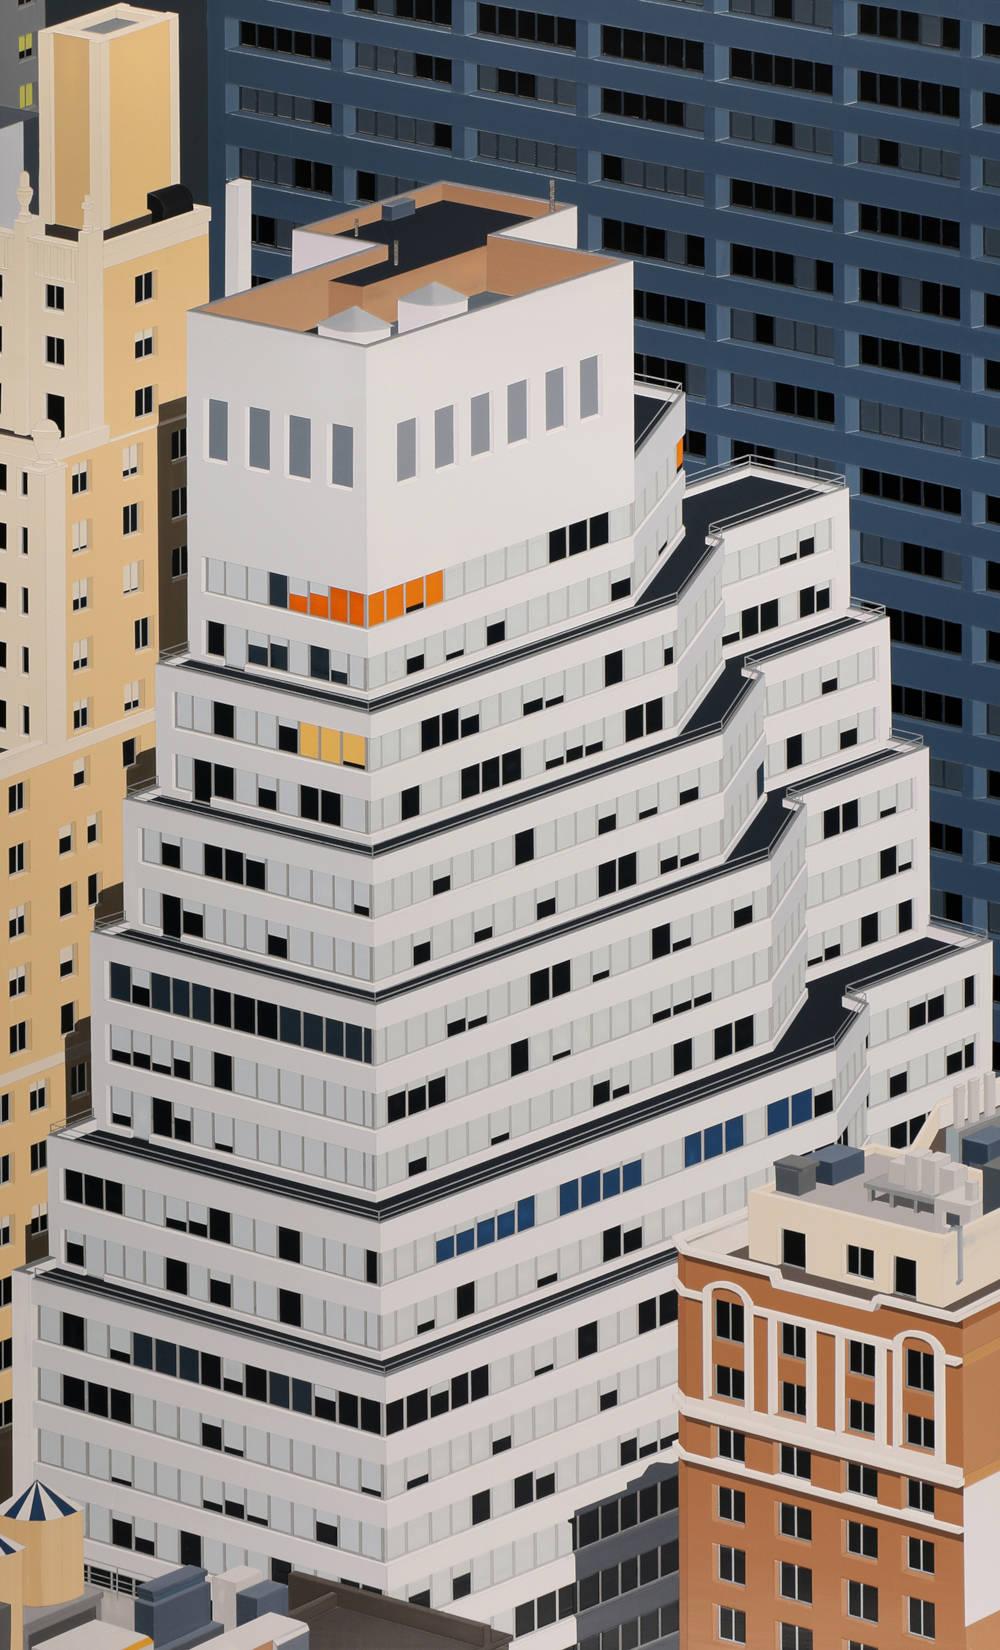 Daniel Rich, Manhattan, 2019. Acrylic on dibond, 100x60 cm